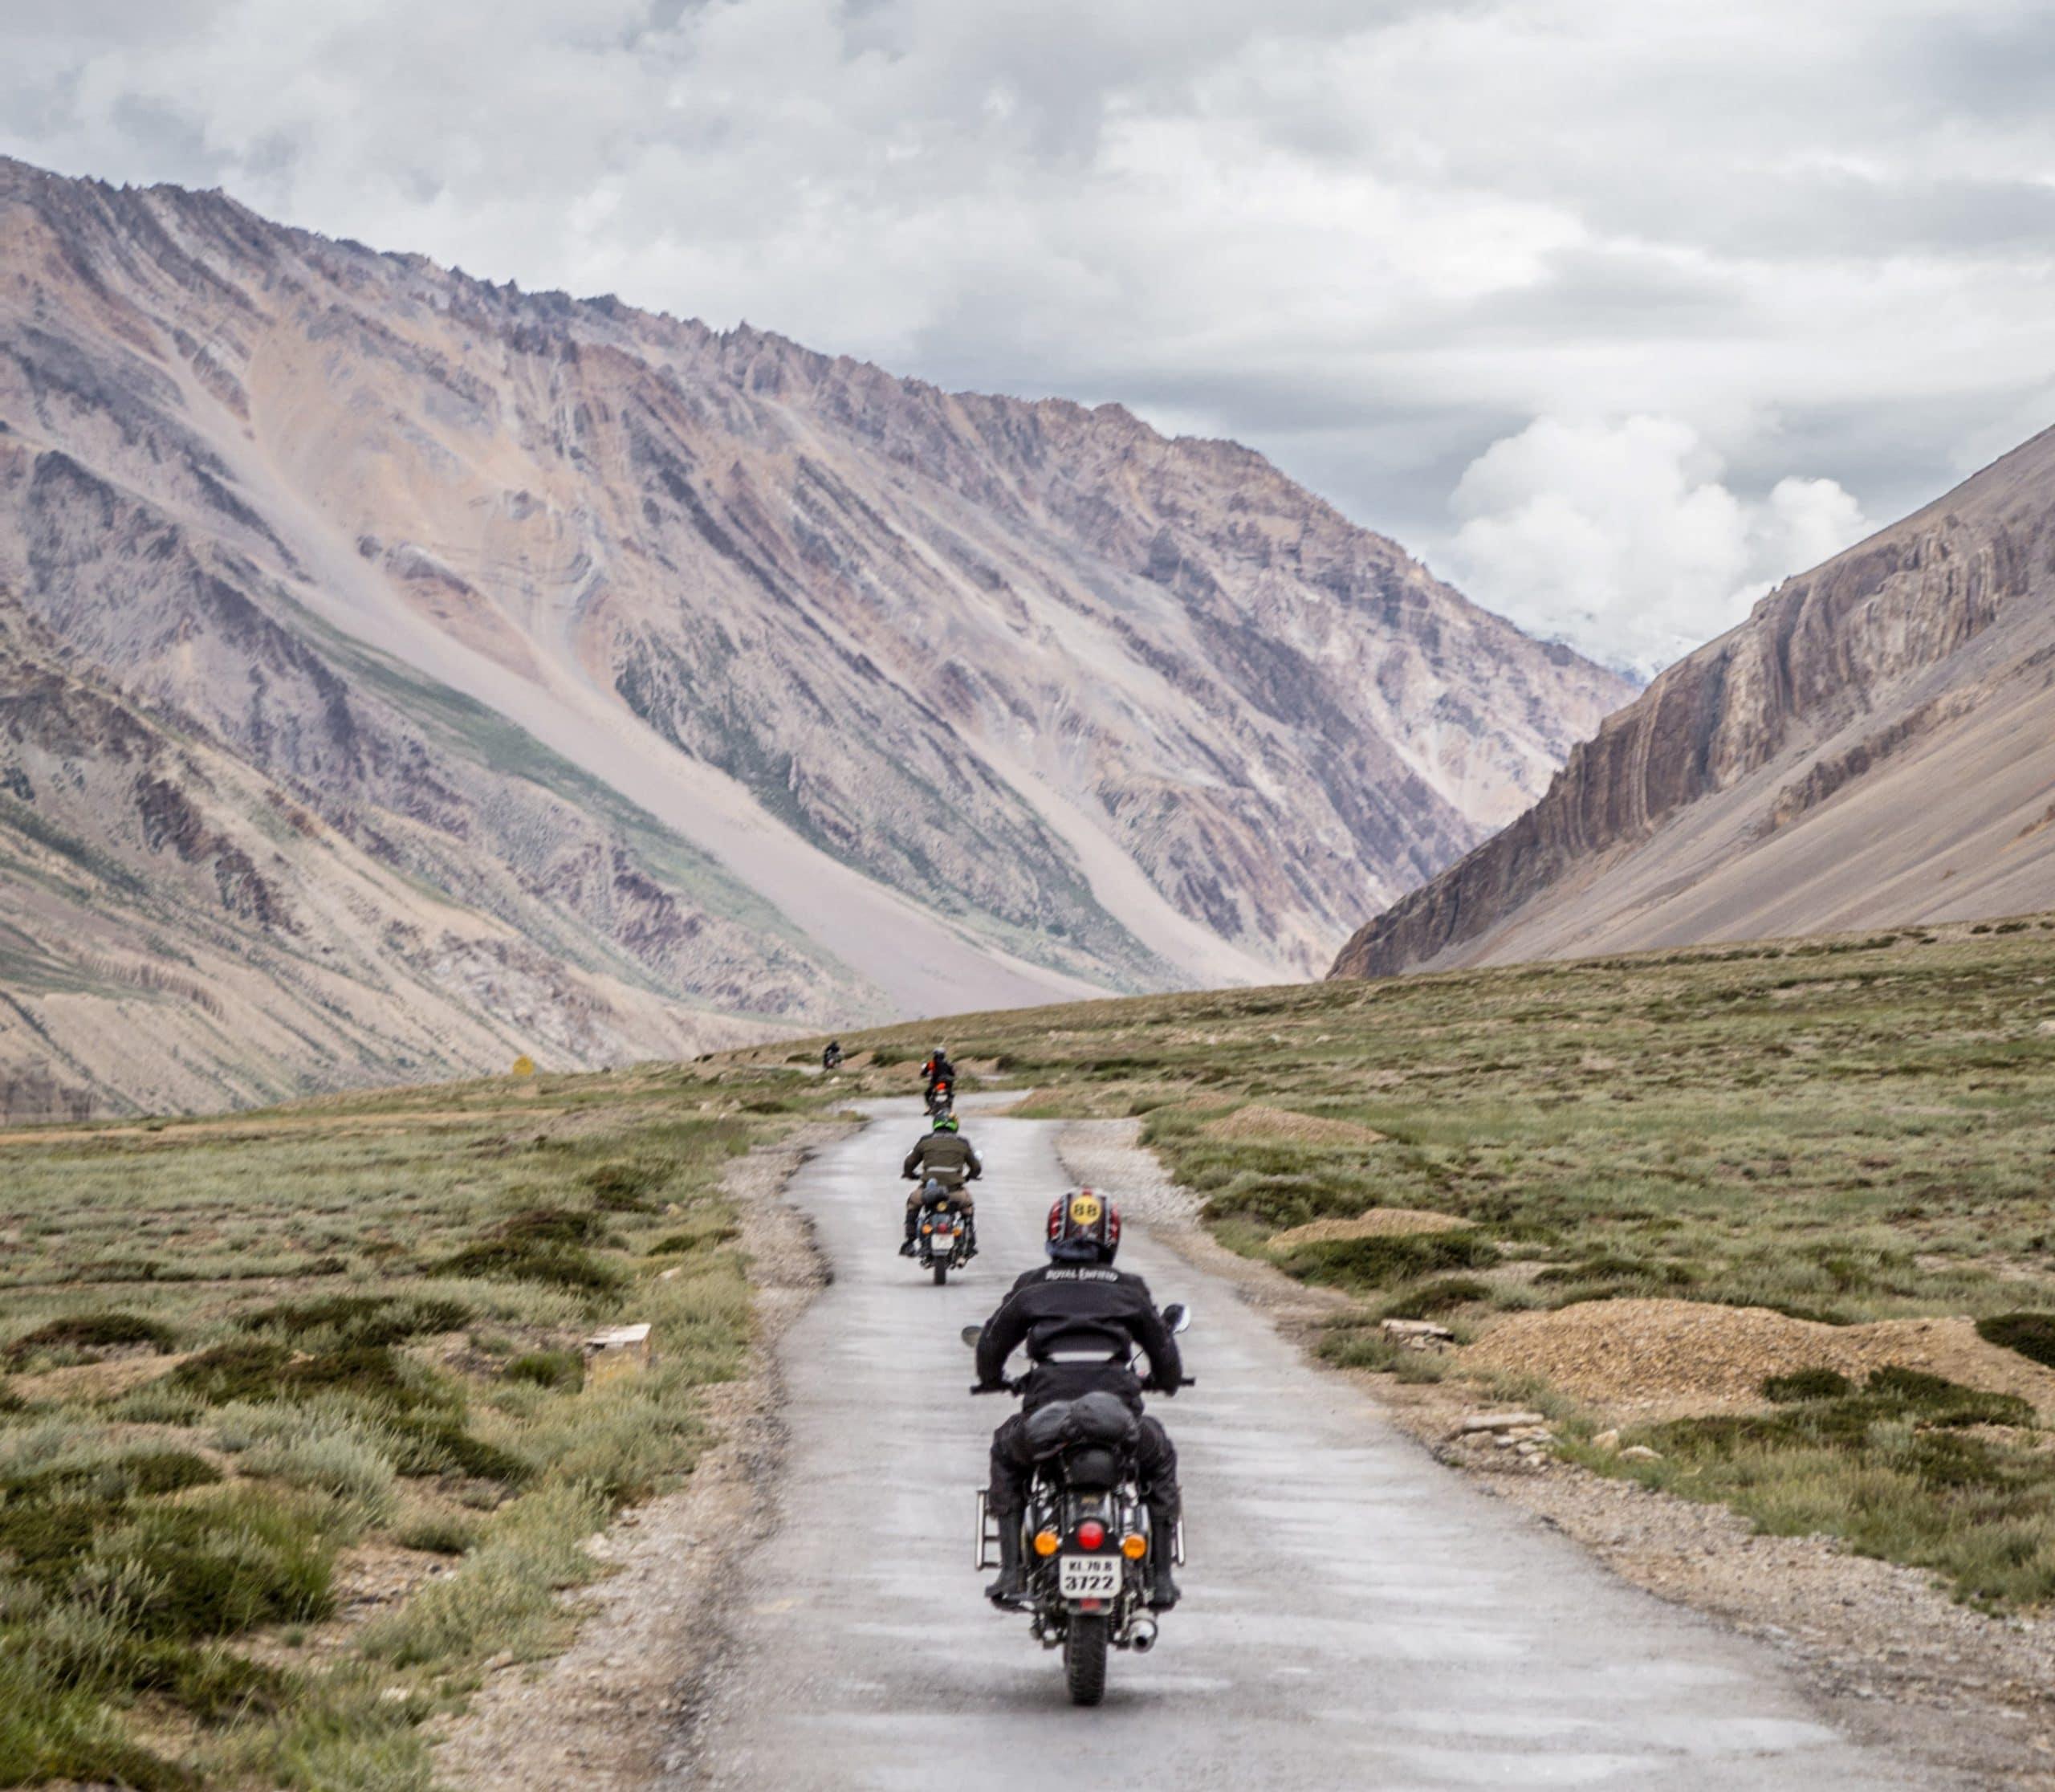 roadtrip moto montagne